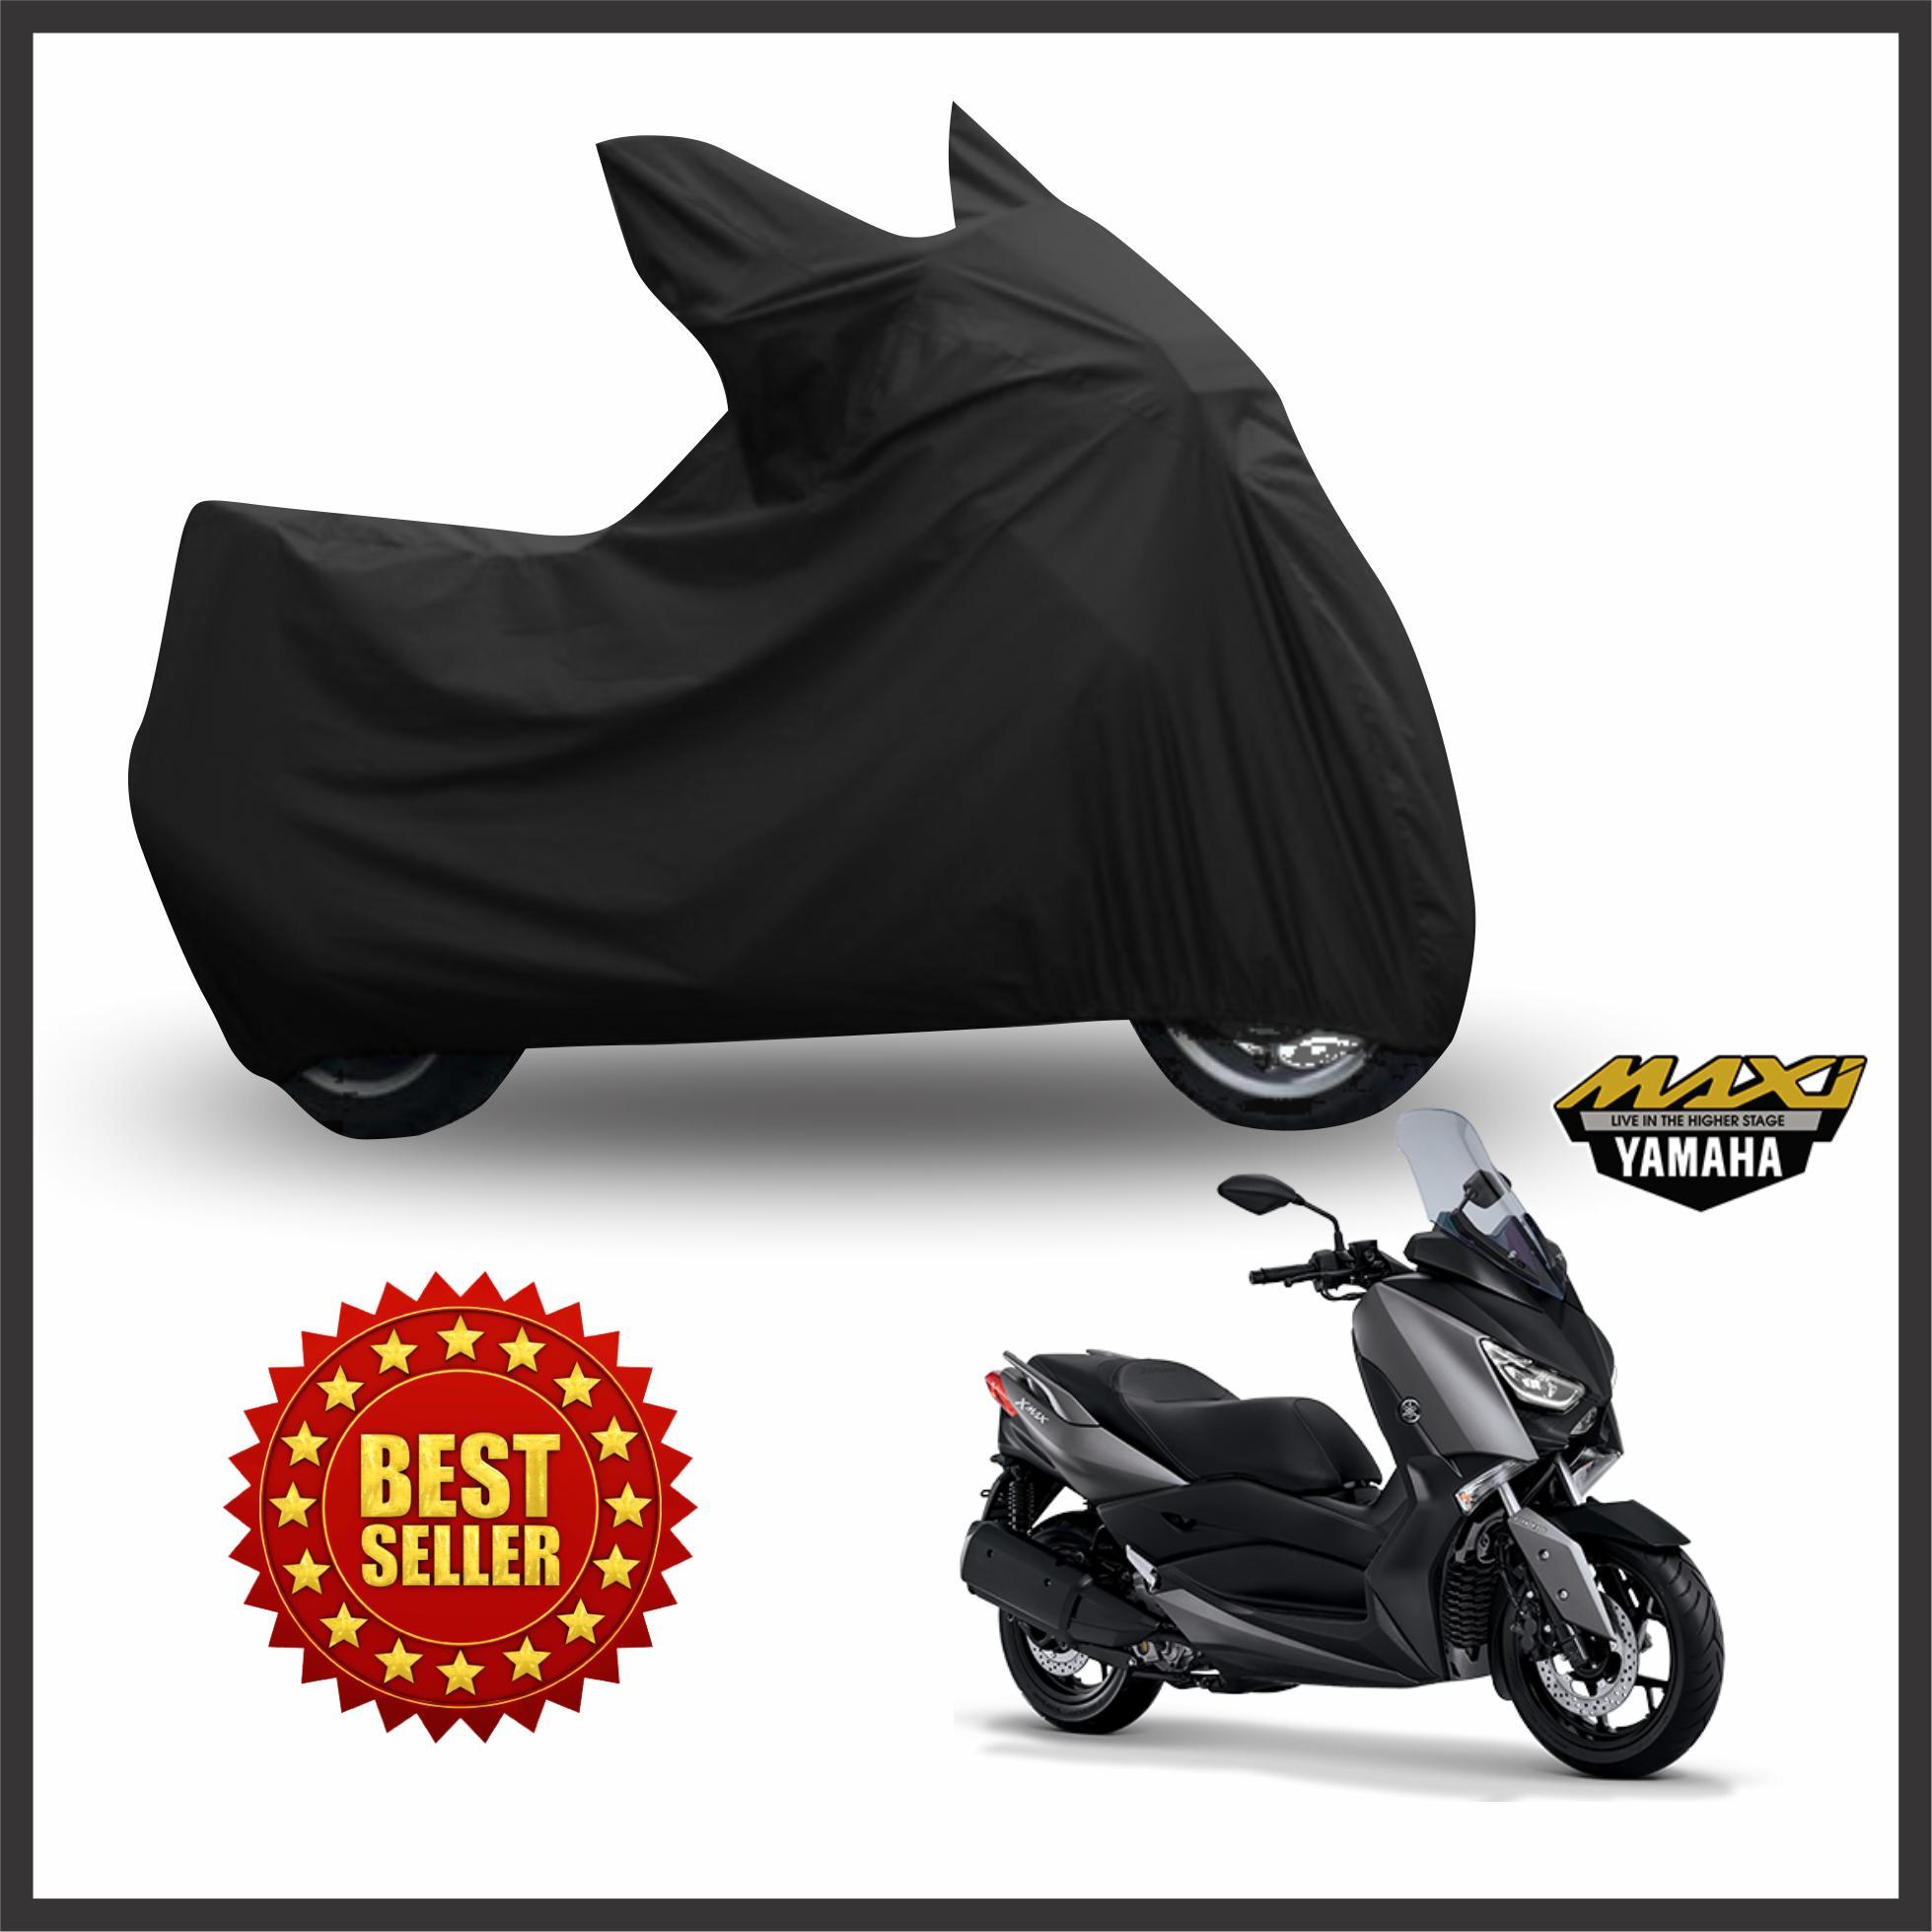 PALING DICARI - Cover Motor Yamaha Xmax 250cc / Sarung Motor Yamaha Xmax 250cc / Pelindung Motor Yamaha Xmax 250cc Premium Hitam Metalik